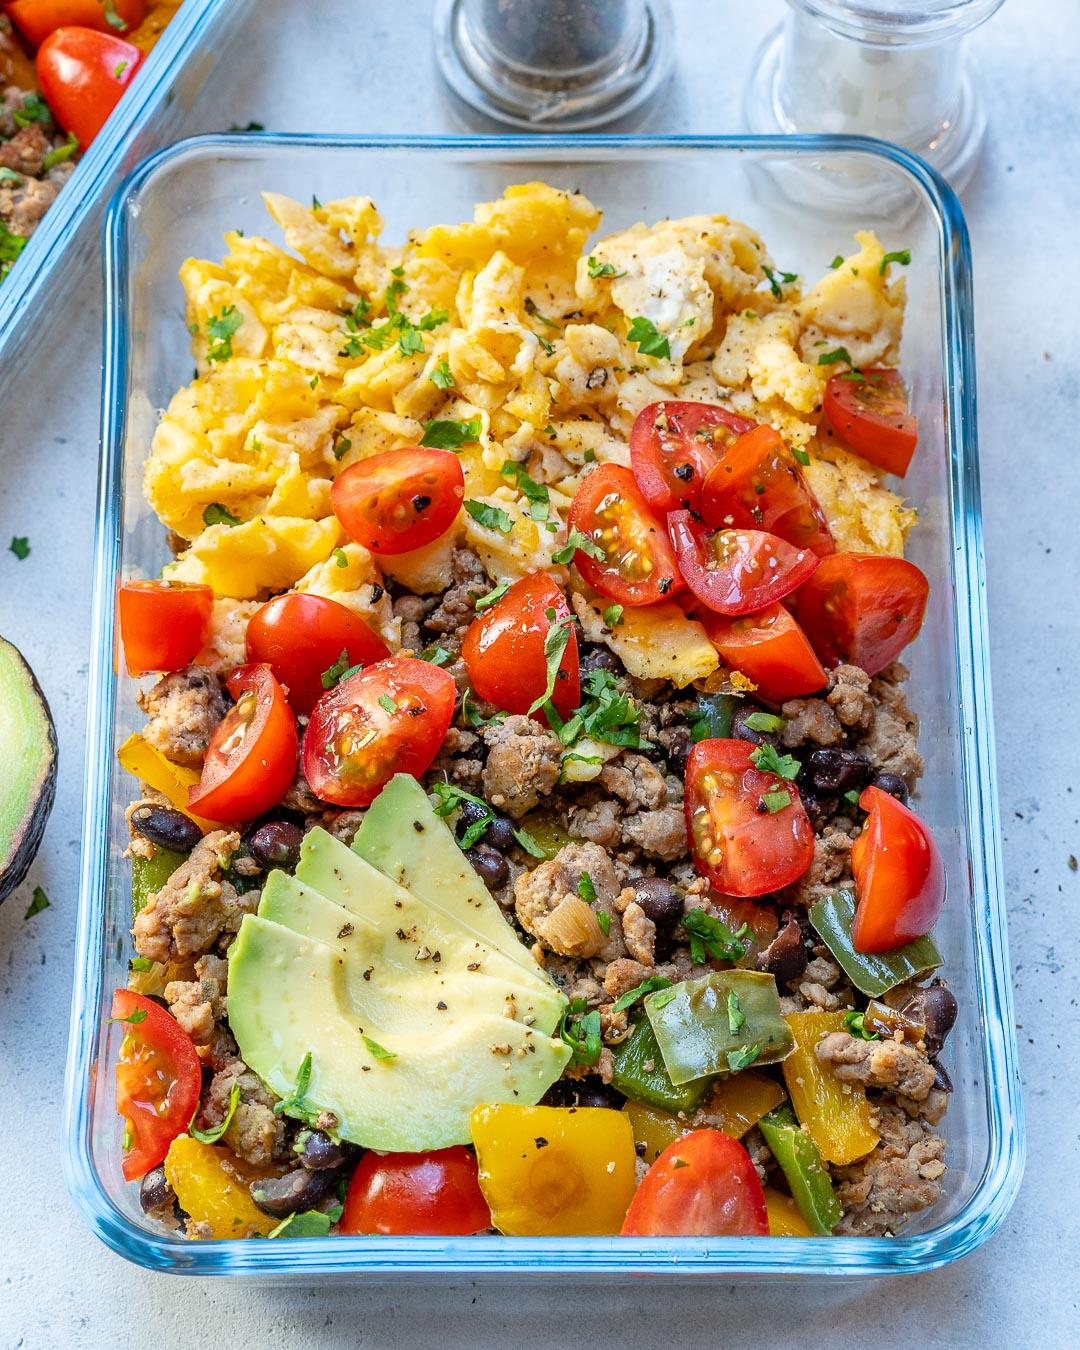 Taco Scramble Meal Prep bowls